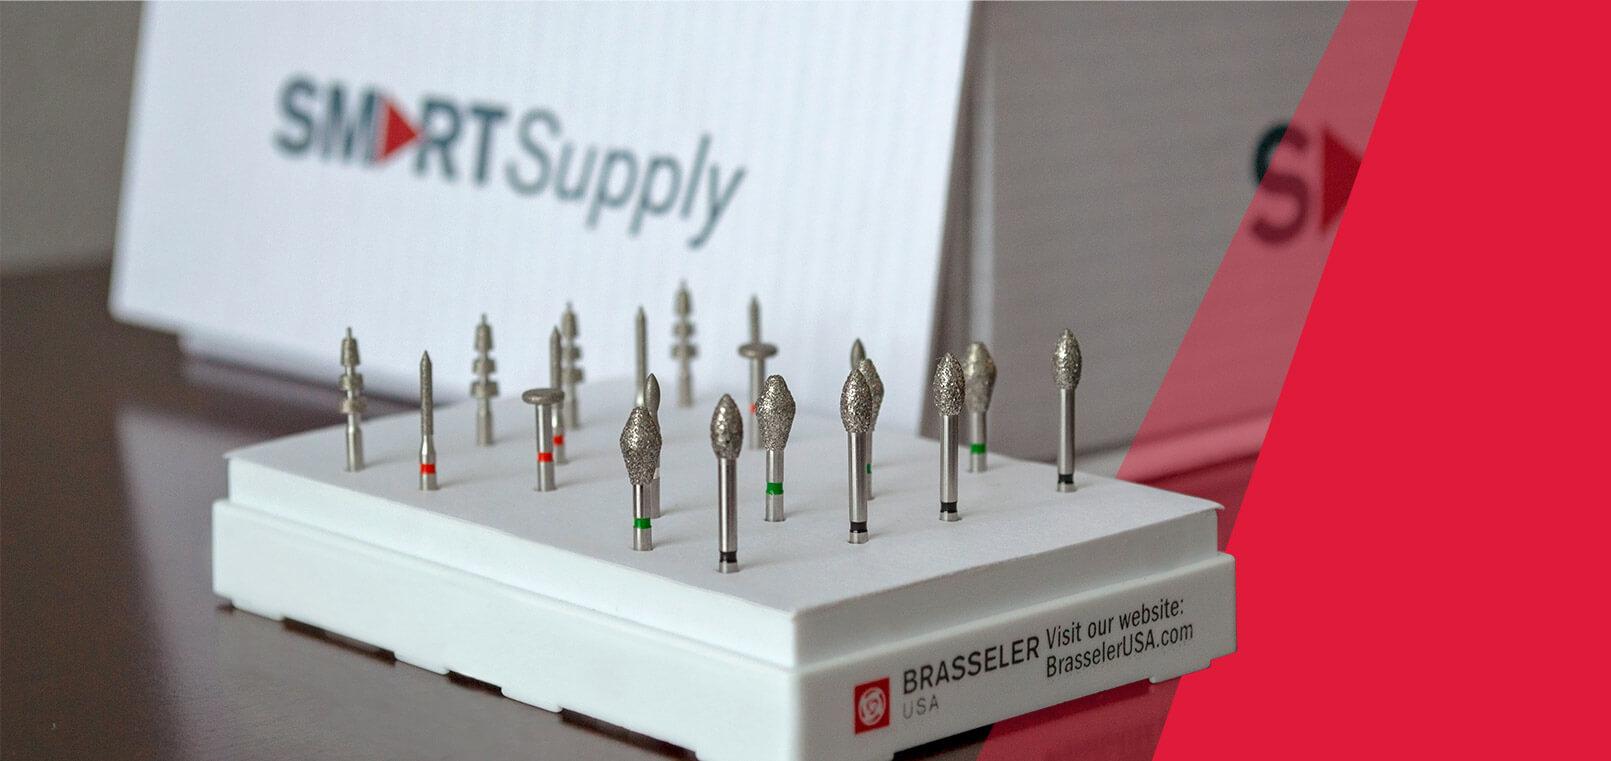 SmartSupply